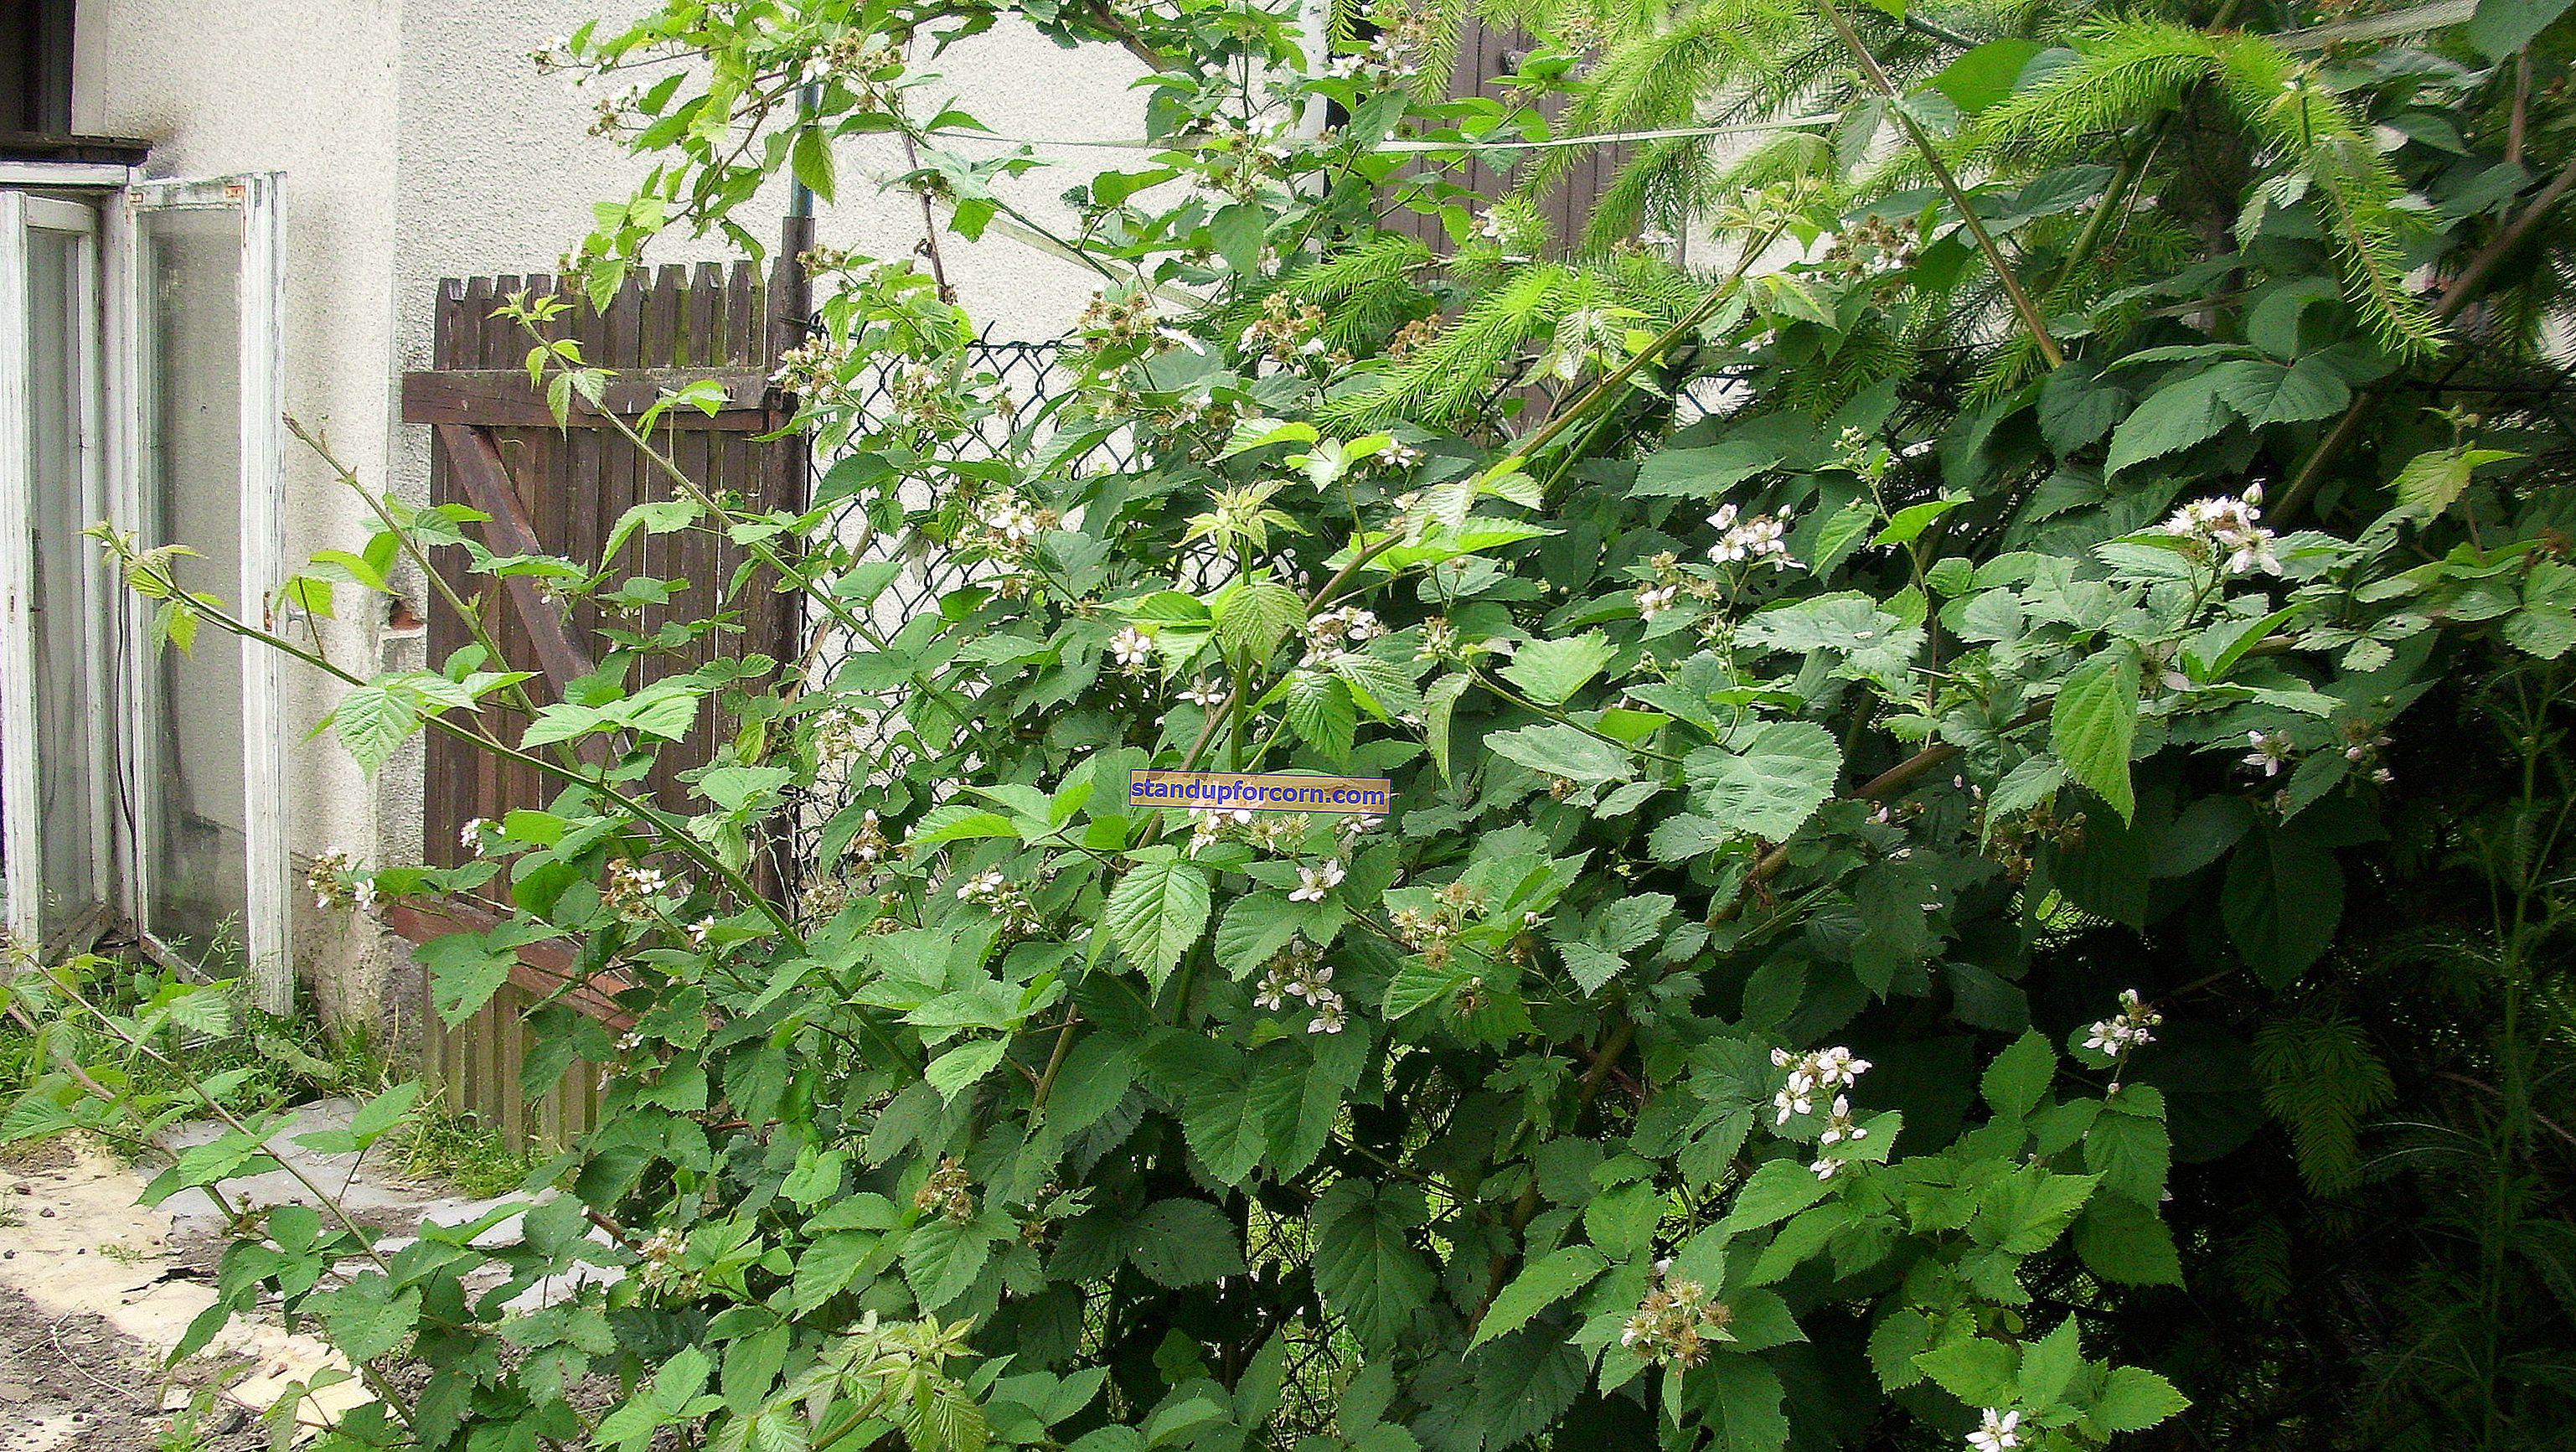 Tornfri brombær - sorter, dyrkning, beskæring